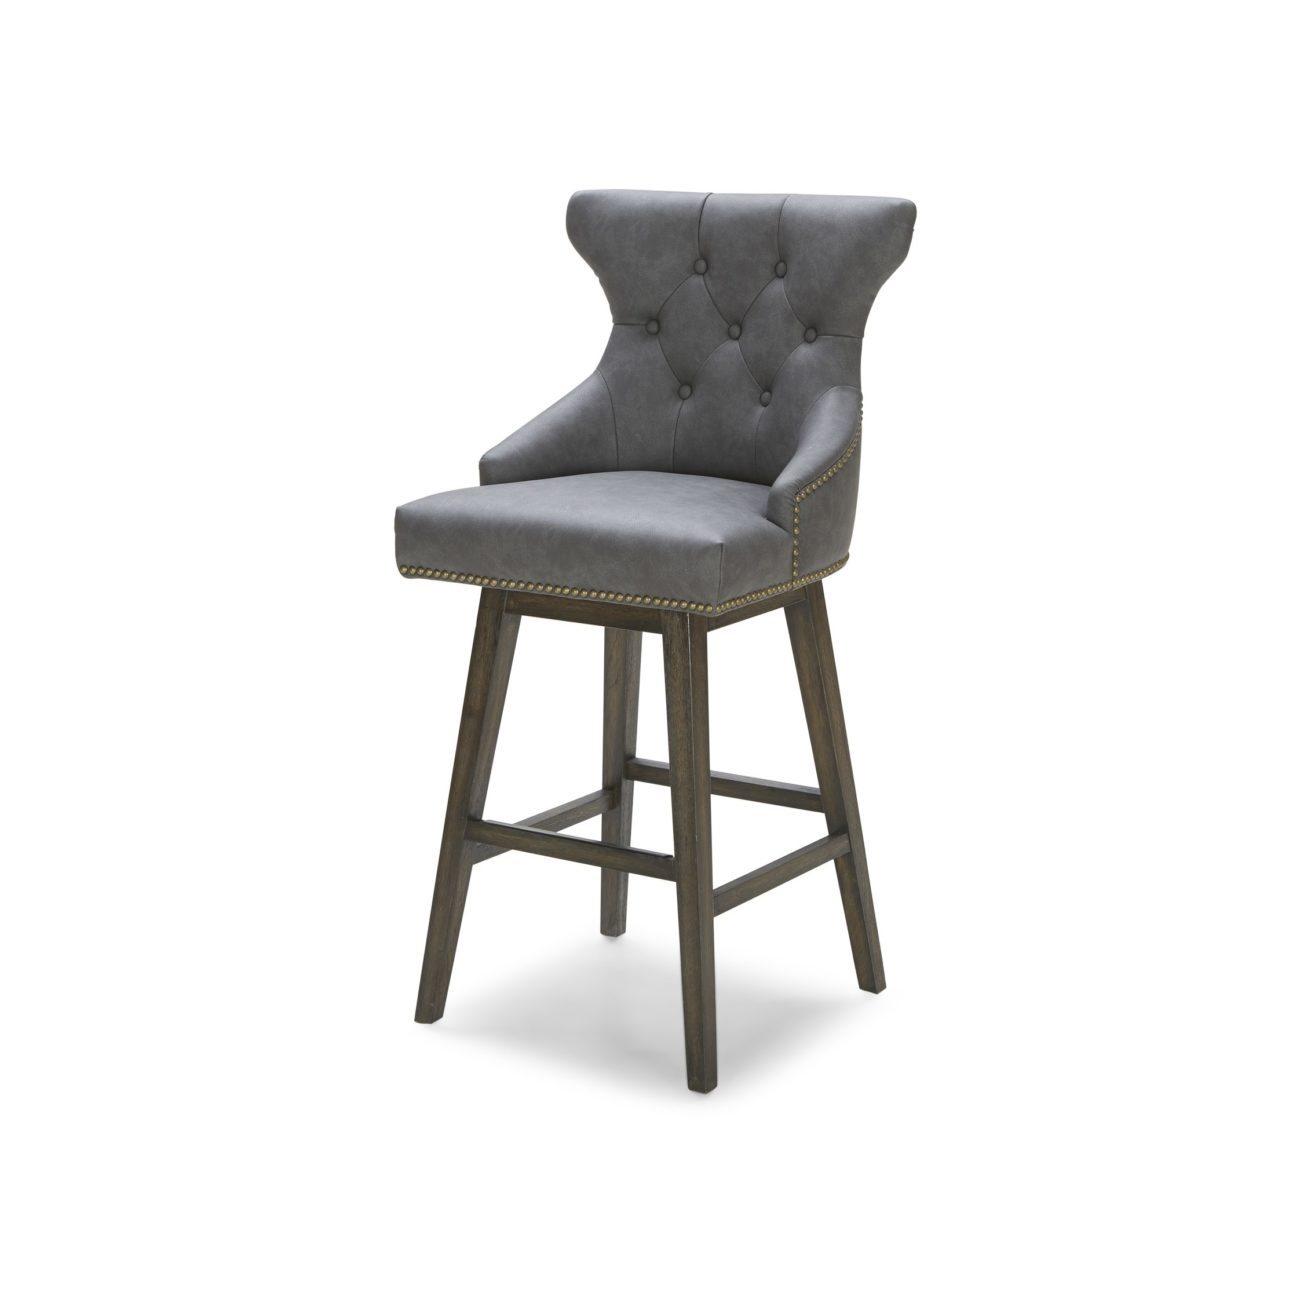 Florence Barstool Horizon Home Furniture : ep39 Y1209CInPixio from horizonhomefurniture.net size 1300 x 1300 jpeg 49kB